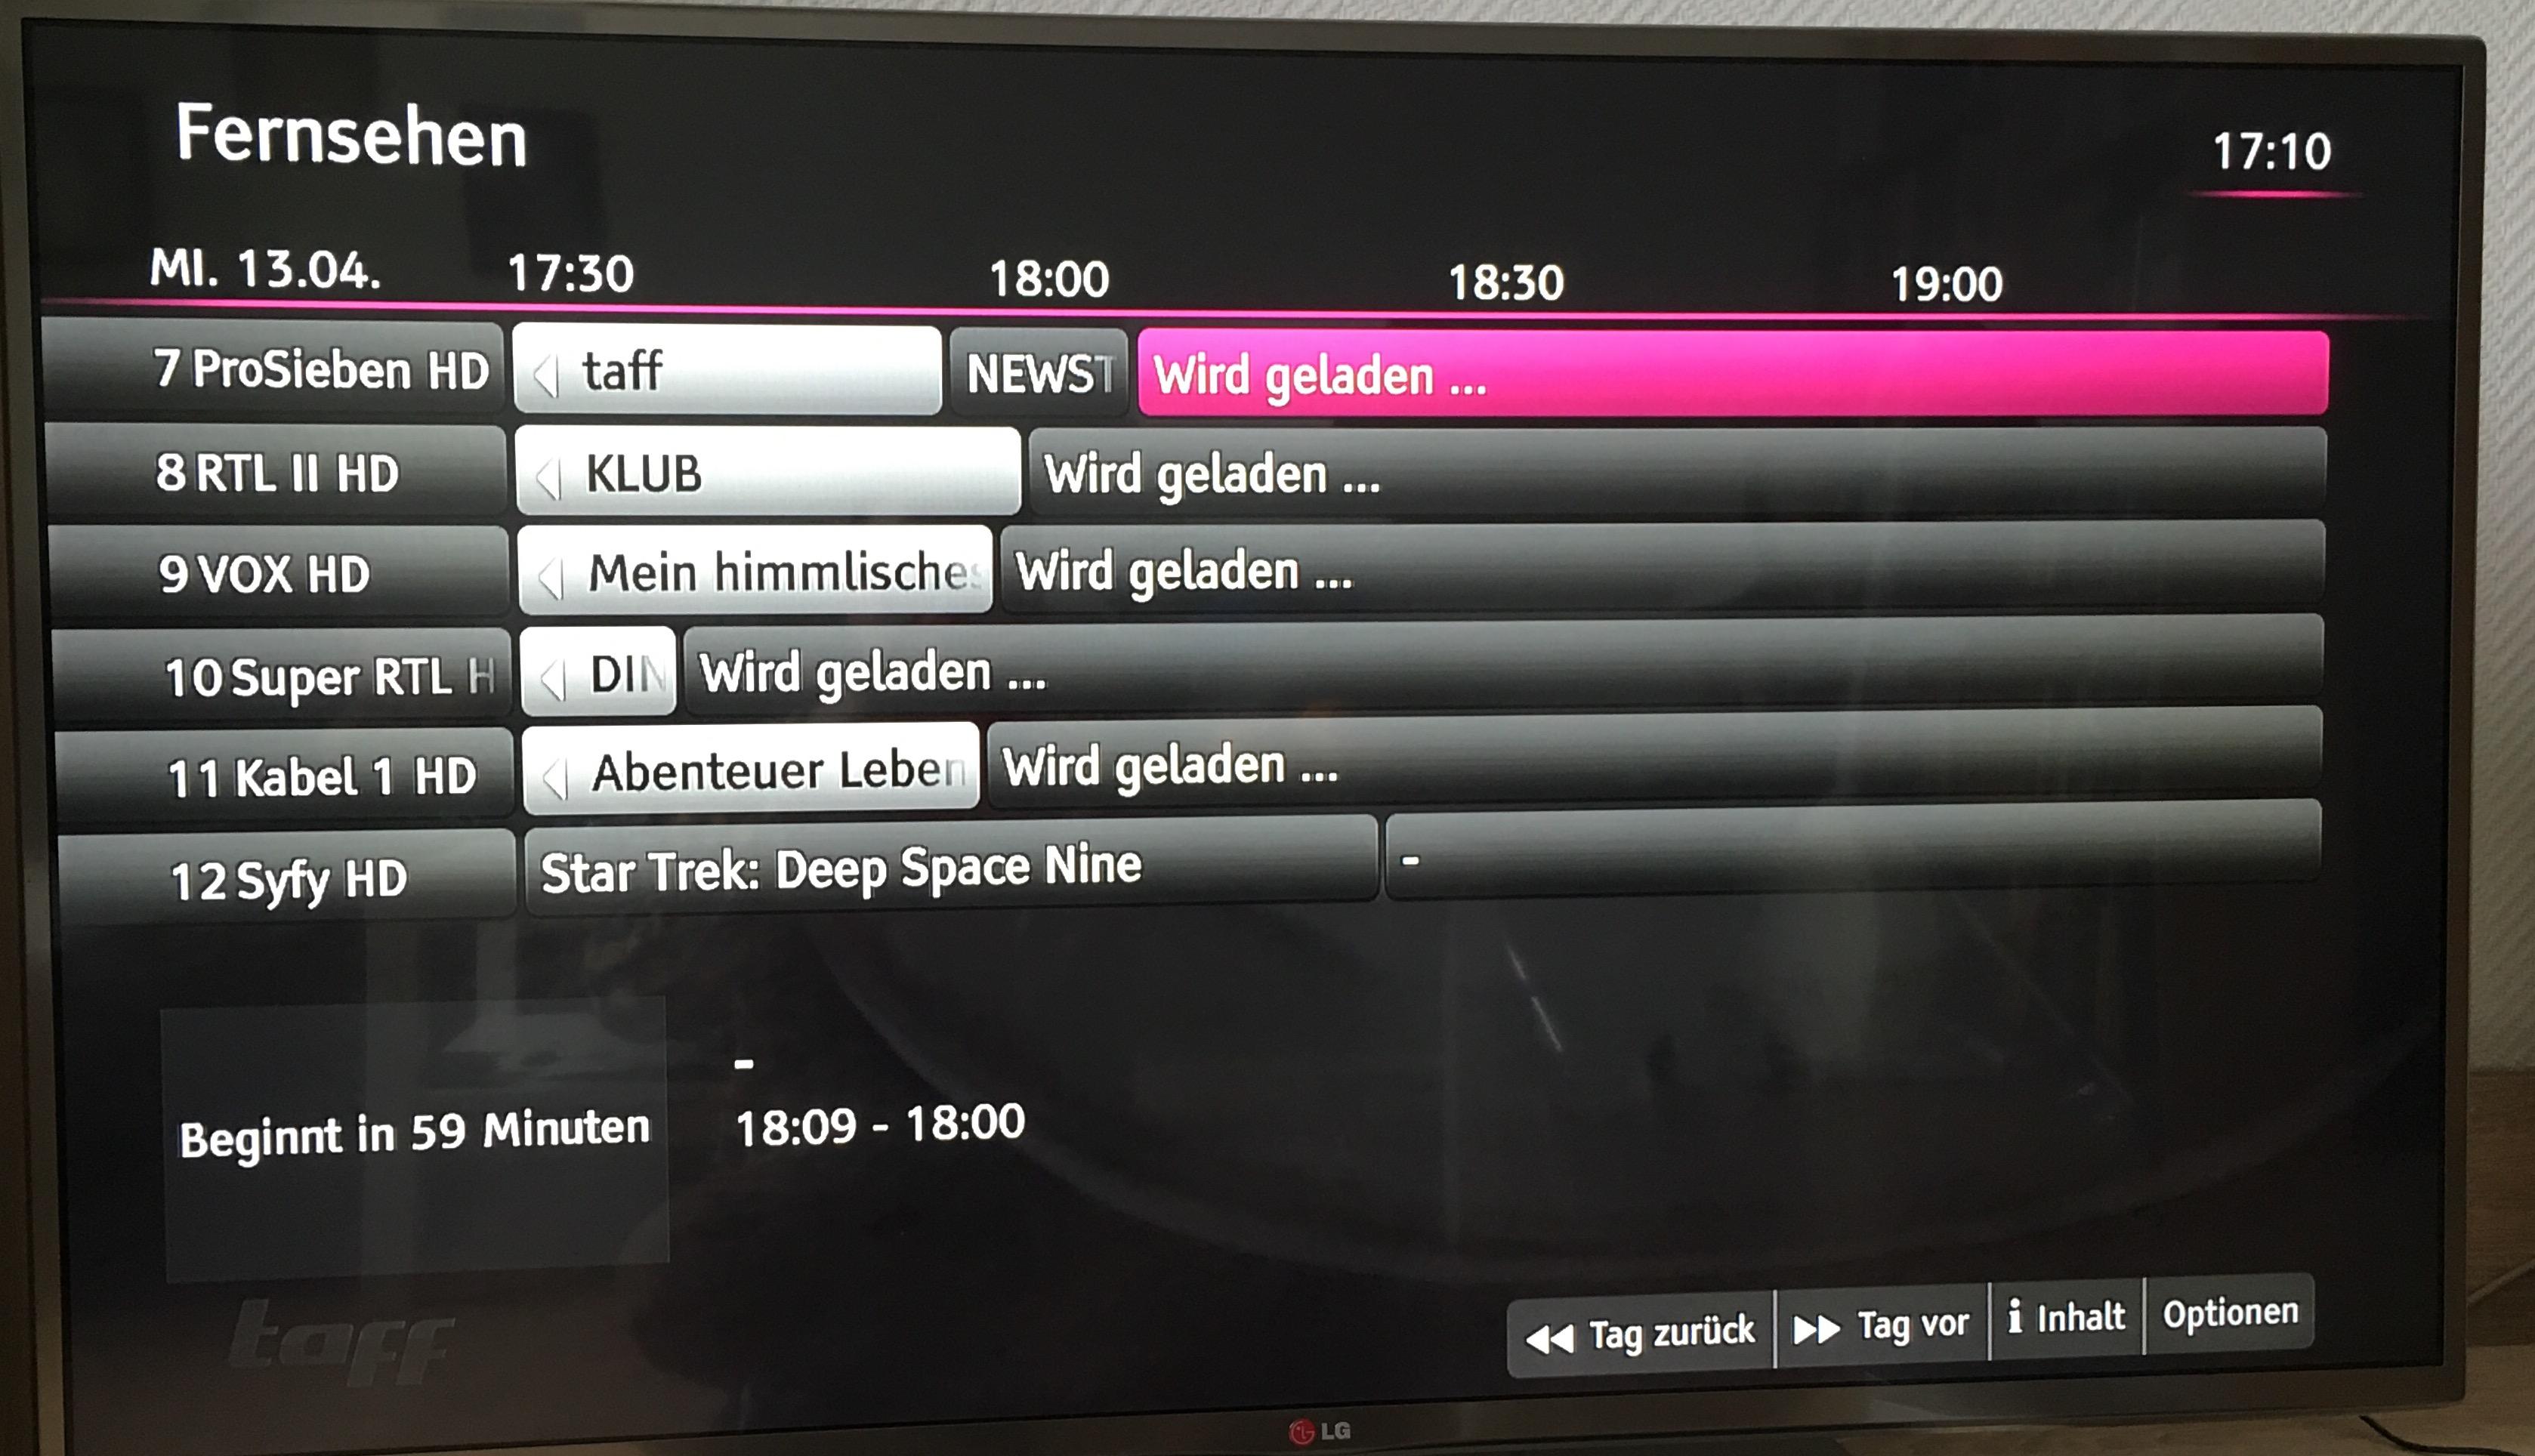 Gelöst Community Probleme Bei Entertainepg Telekom Hilft